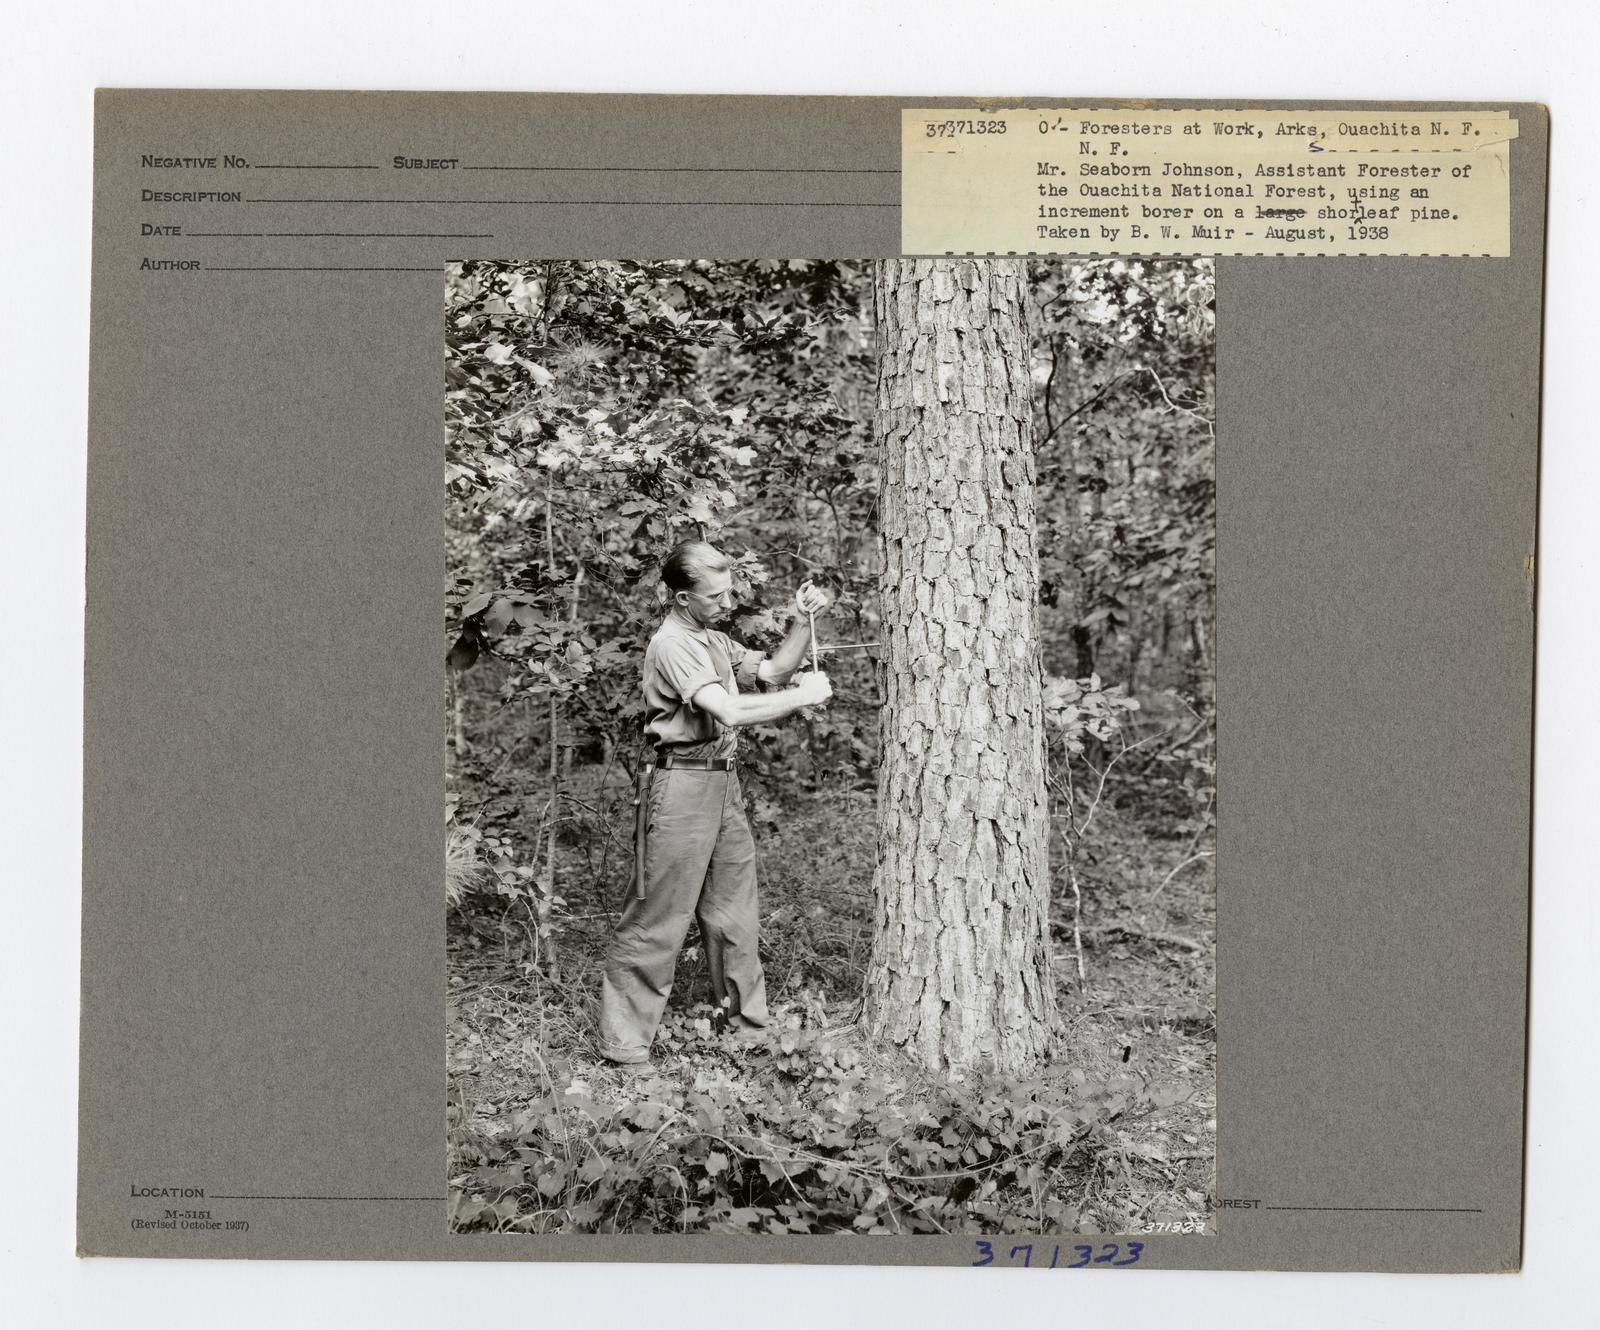 Forest Mensuration: Surveying/Studies - Arkansas